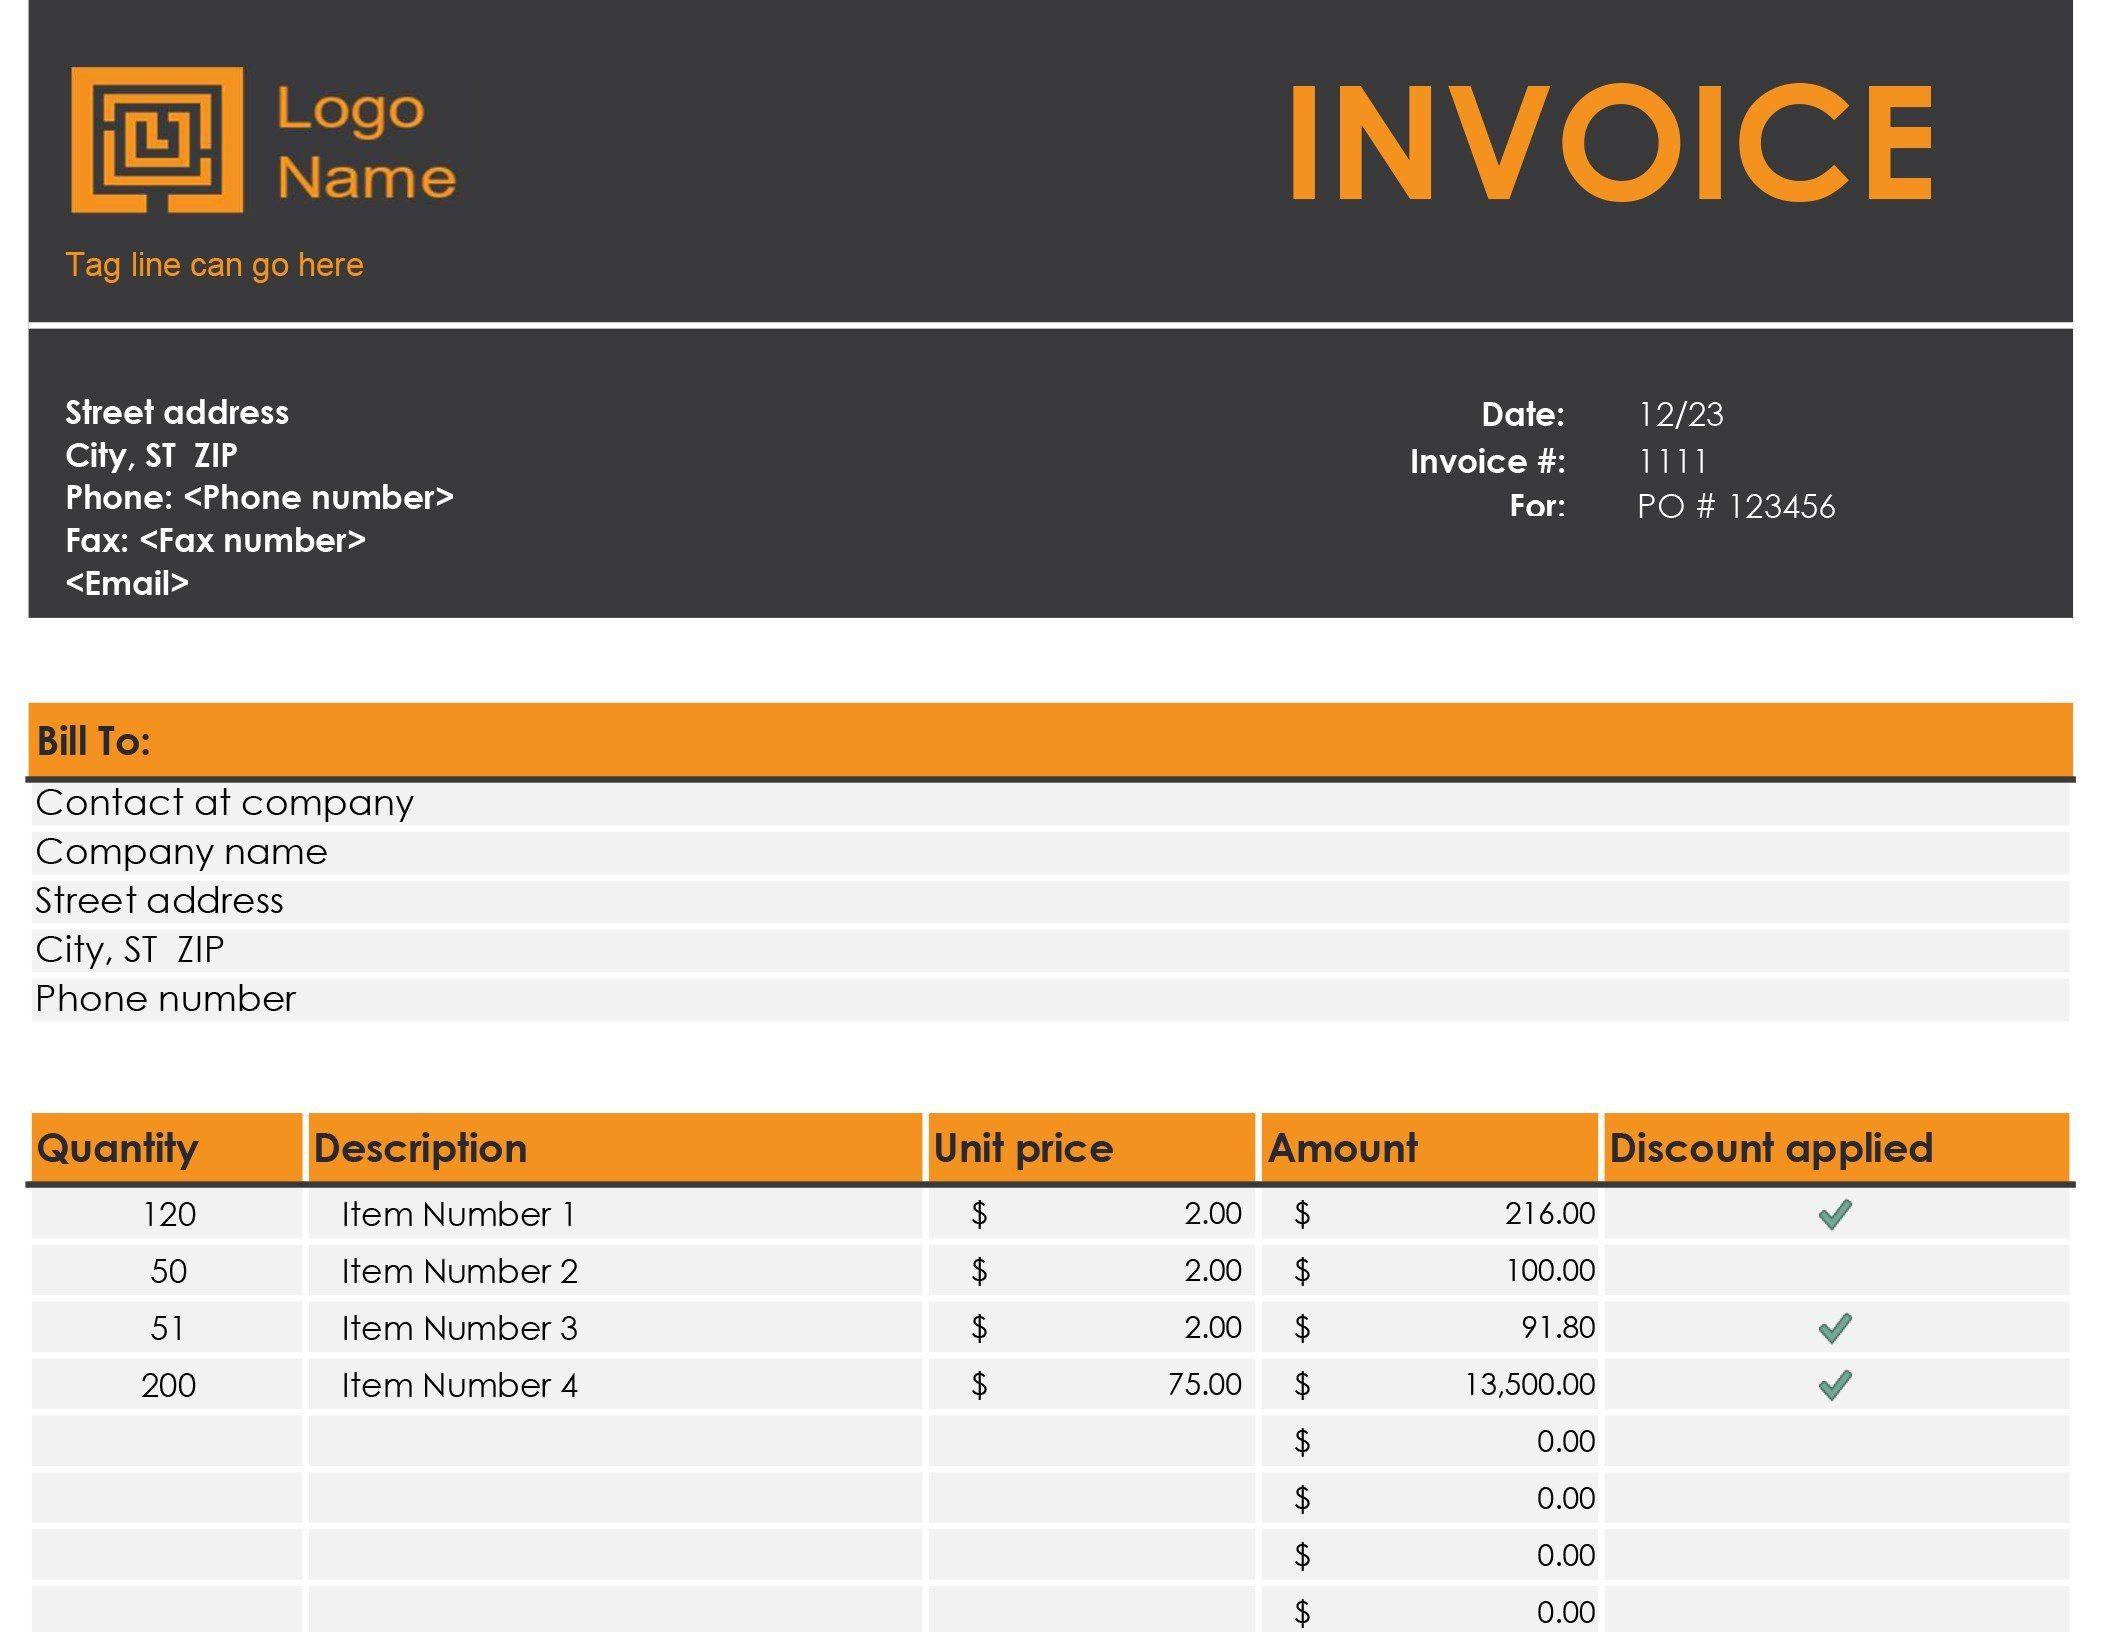 Invoice Tracker Regarding Invoice Tracking Spreadsheet Template 10 Professional Templates Ideas Invoice Template Invoice Template Word Spreadsheet Template